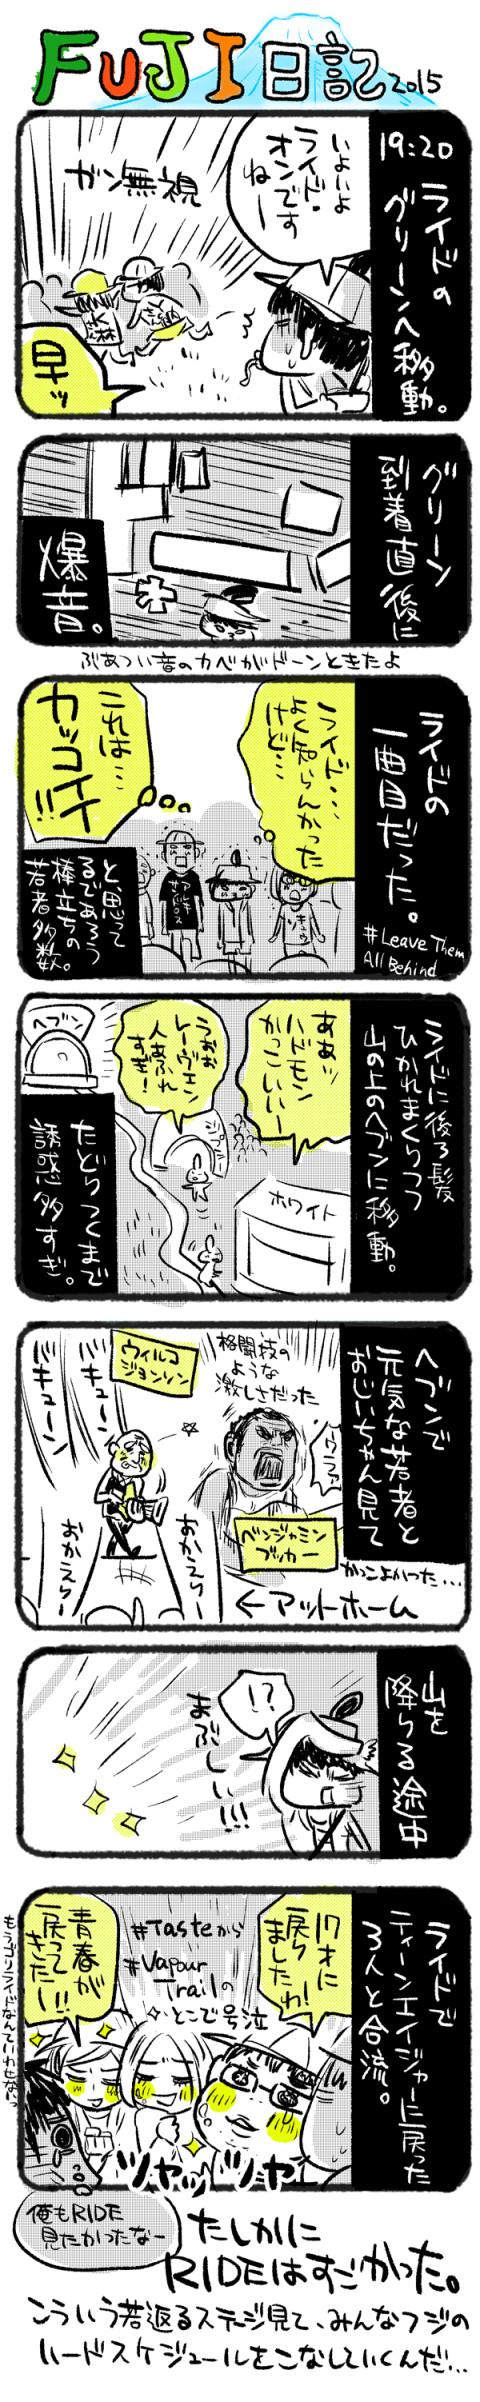 fuji4ed